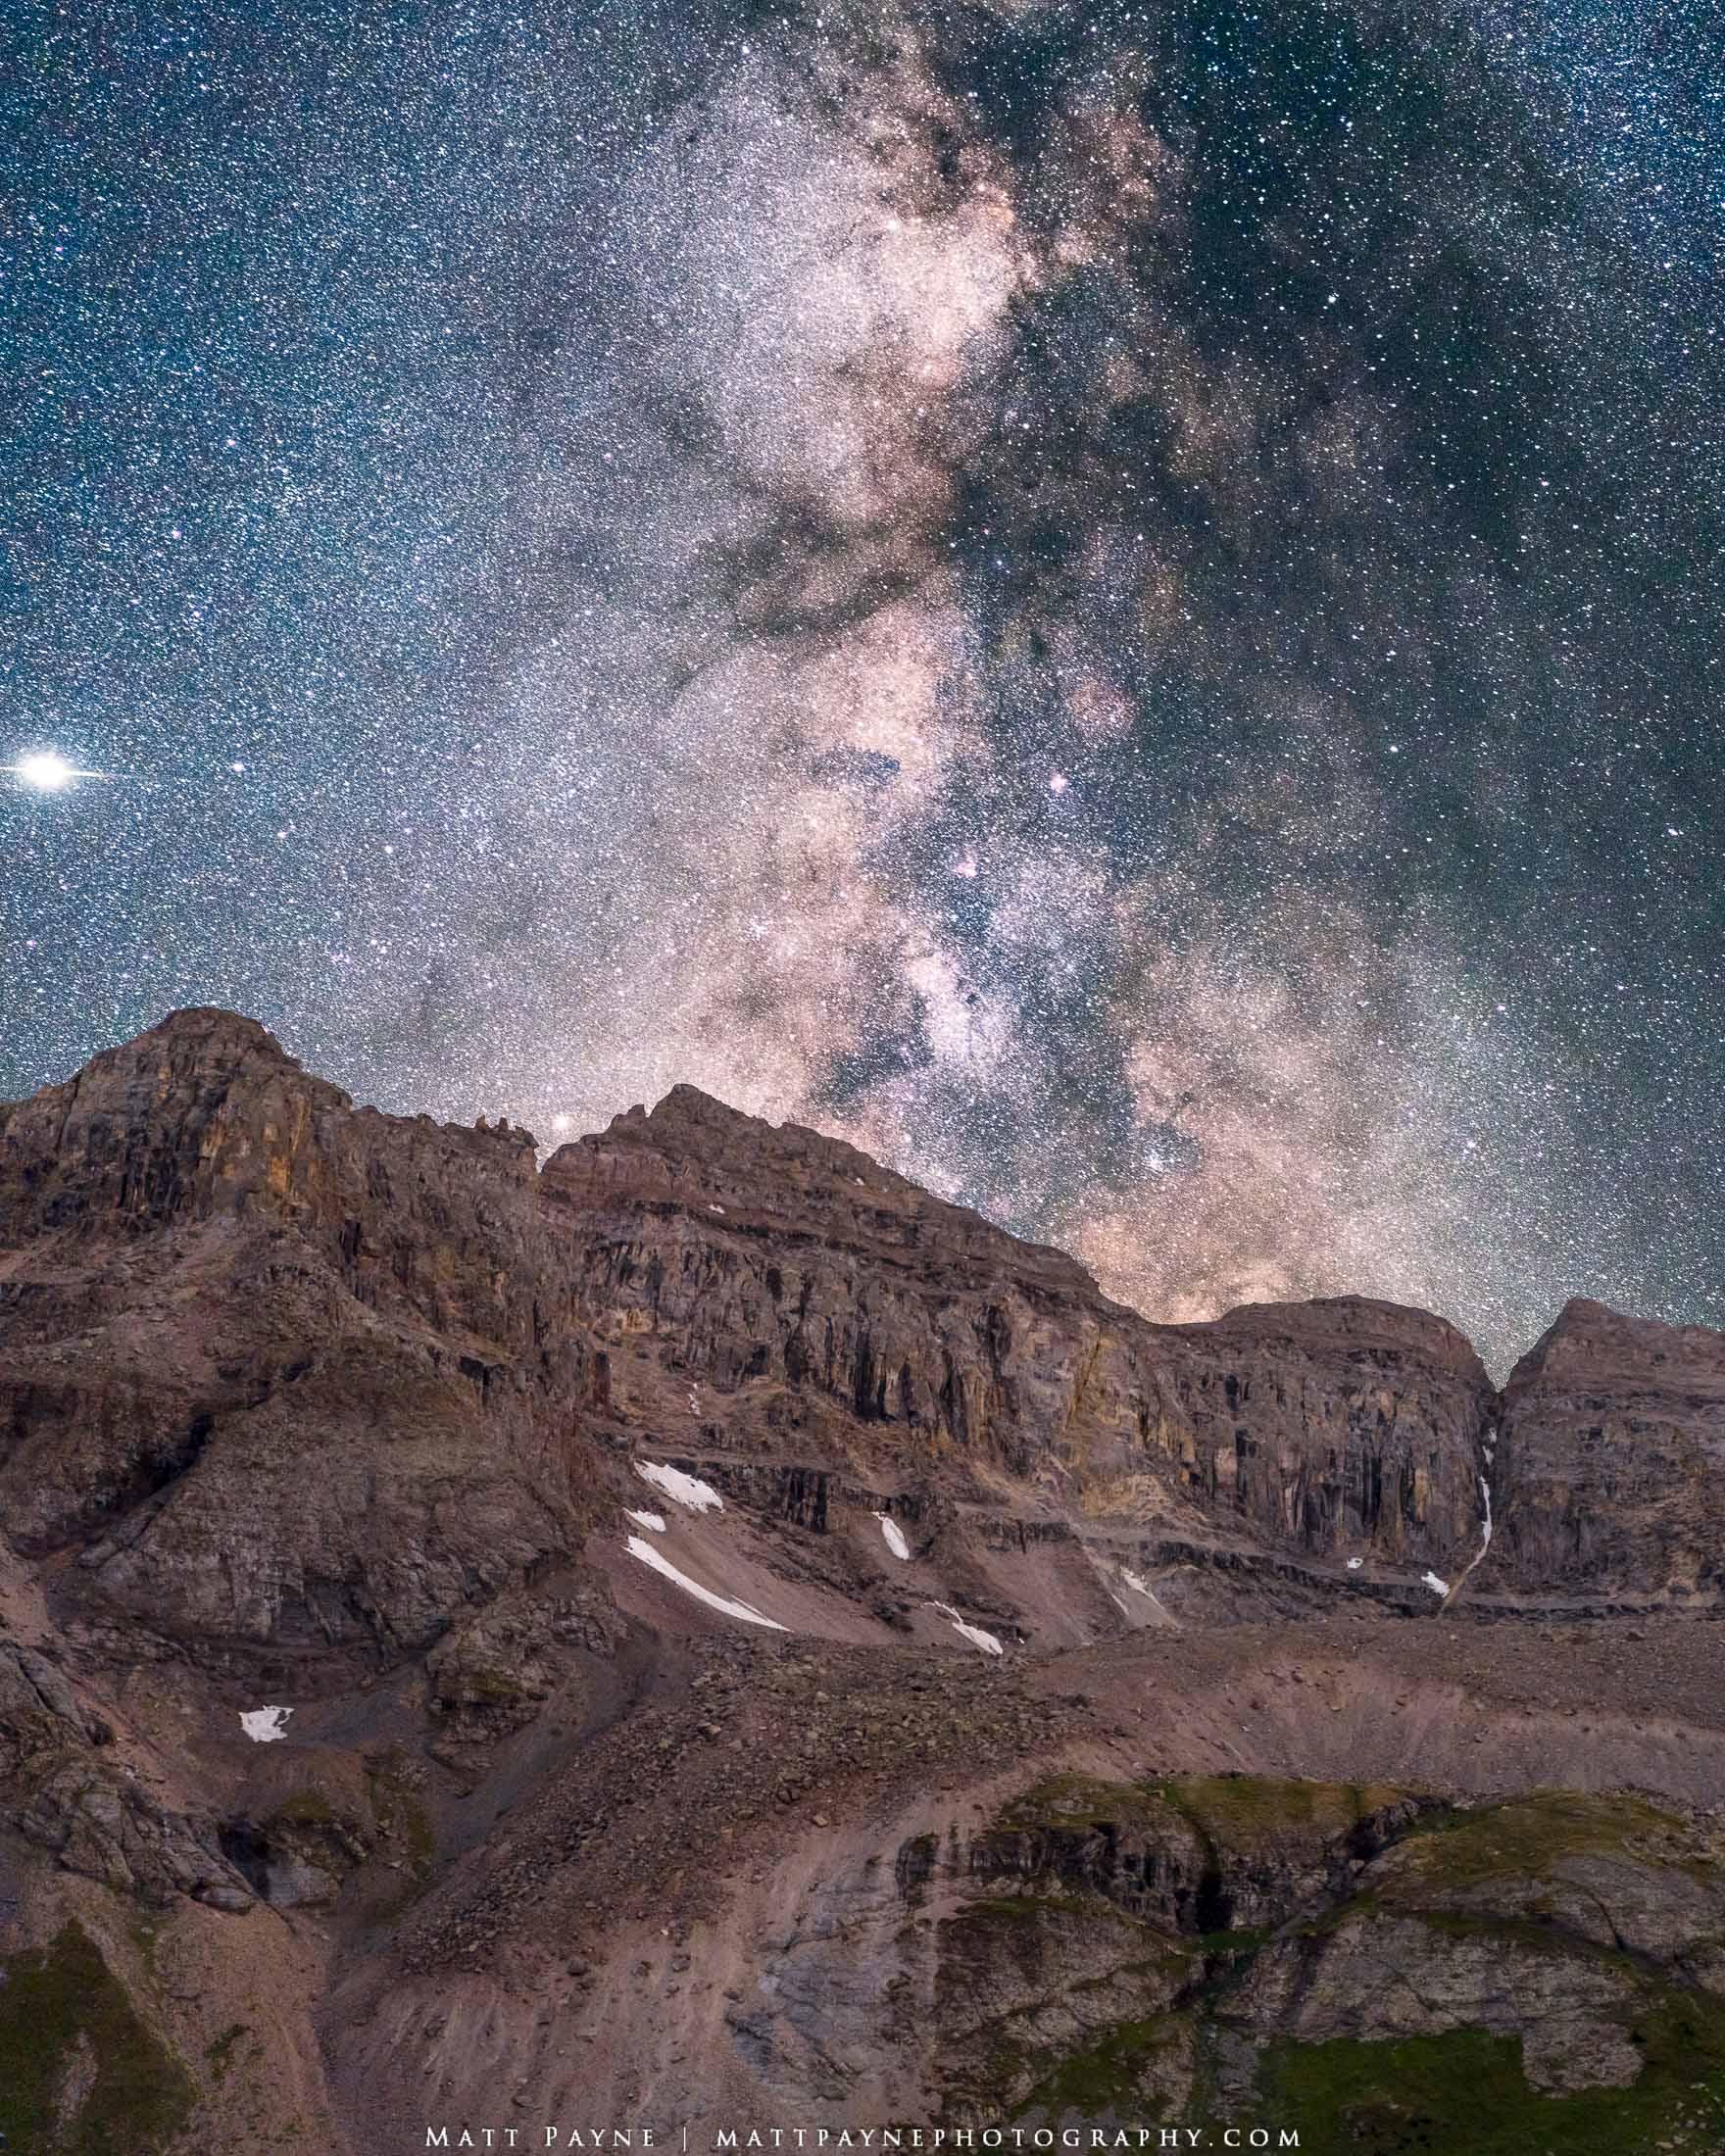 Milky Way, San Juan Mountains, Colorado, Night, Dallas Peak, Mountains, 13er, Mount Sneffels Wilderness, Galaxy, Telluride, Ridgway, Landscape Photography, photo